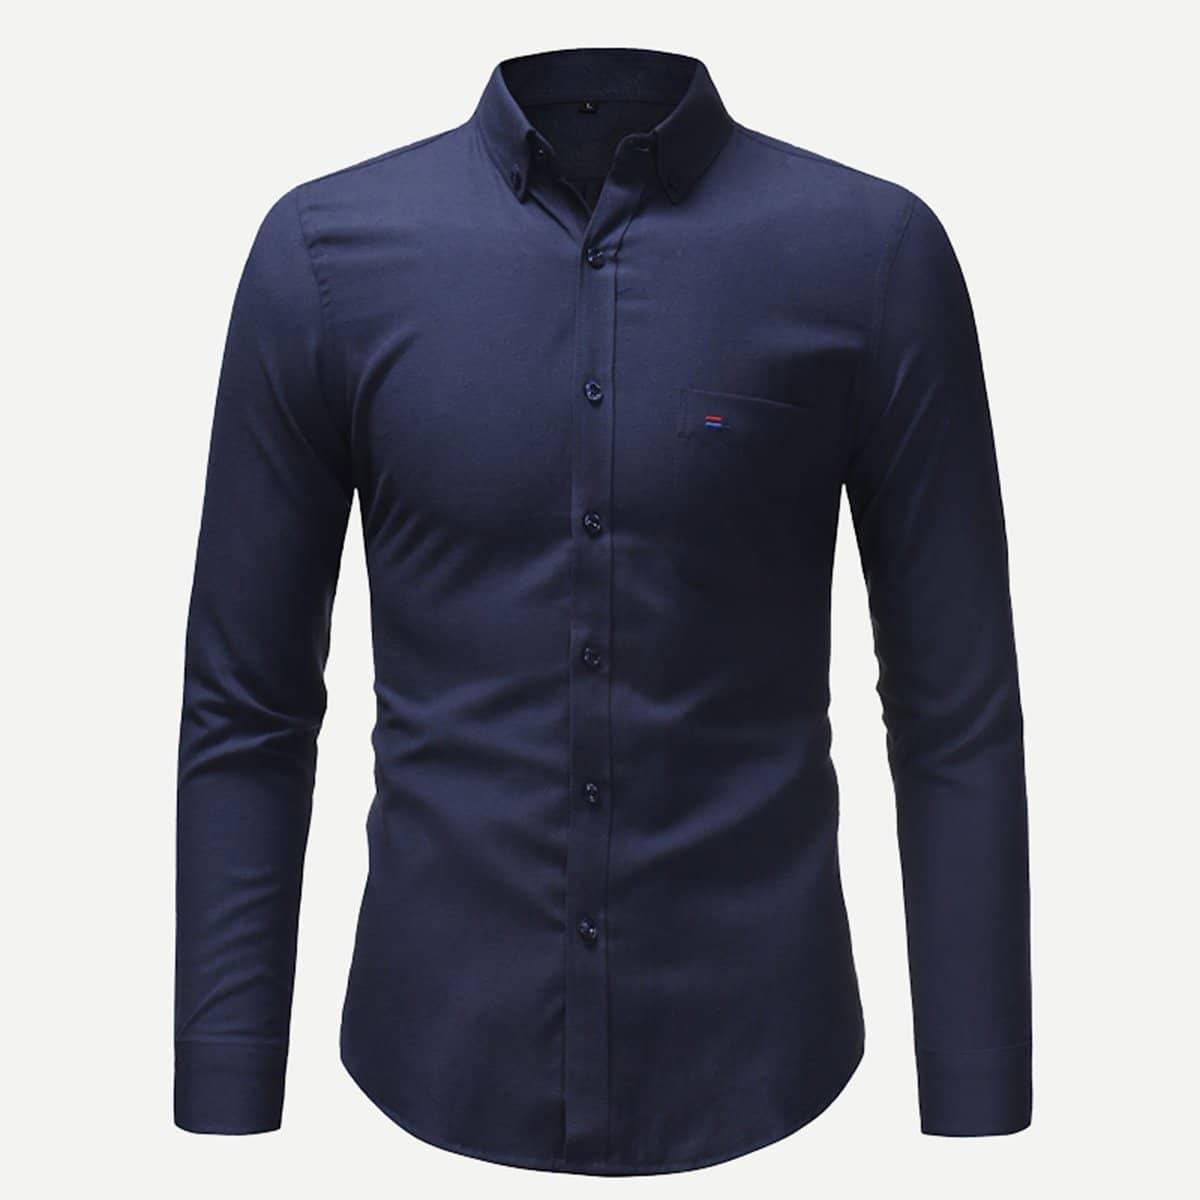 SHEIN coupon: Men Solid Skinny Shirt